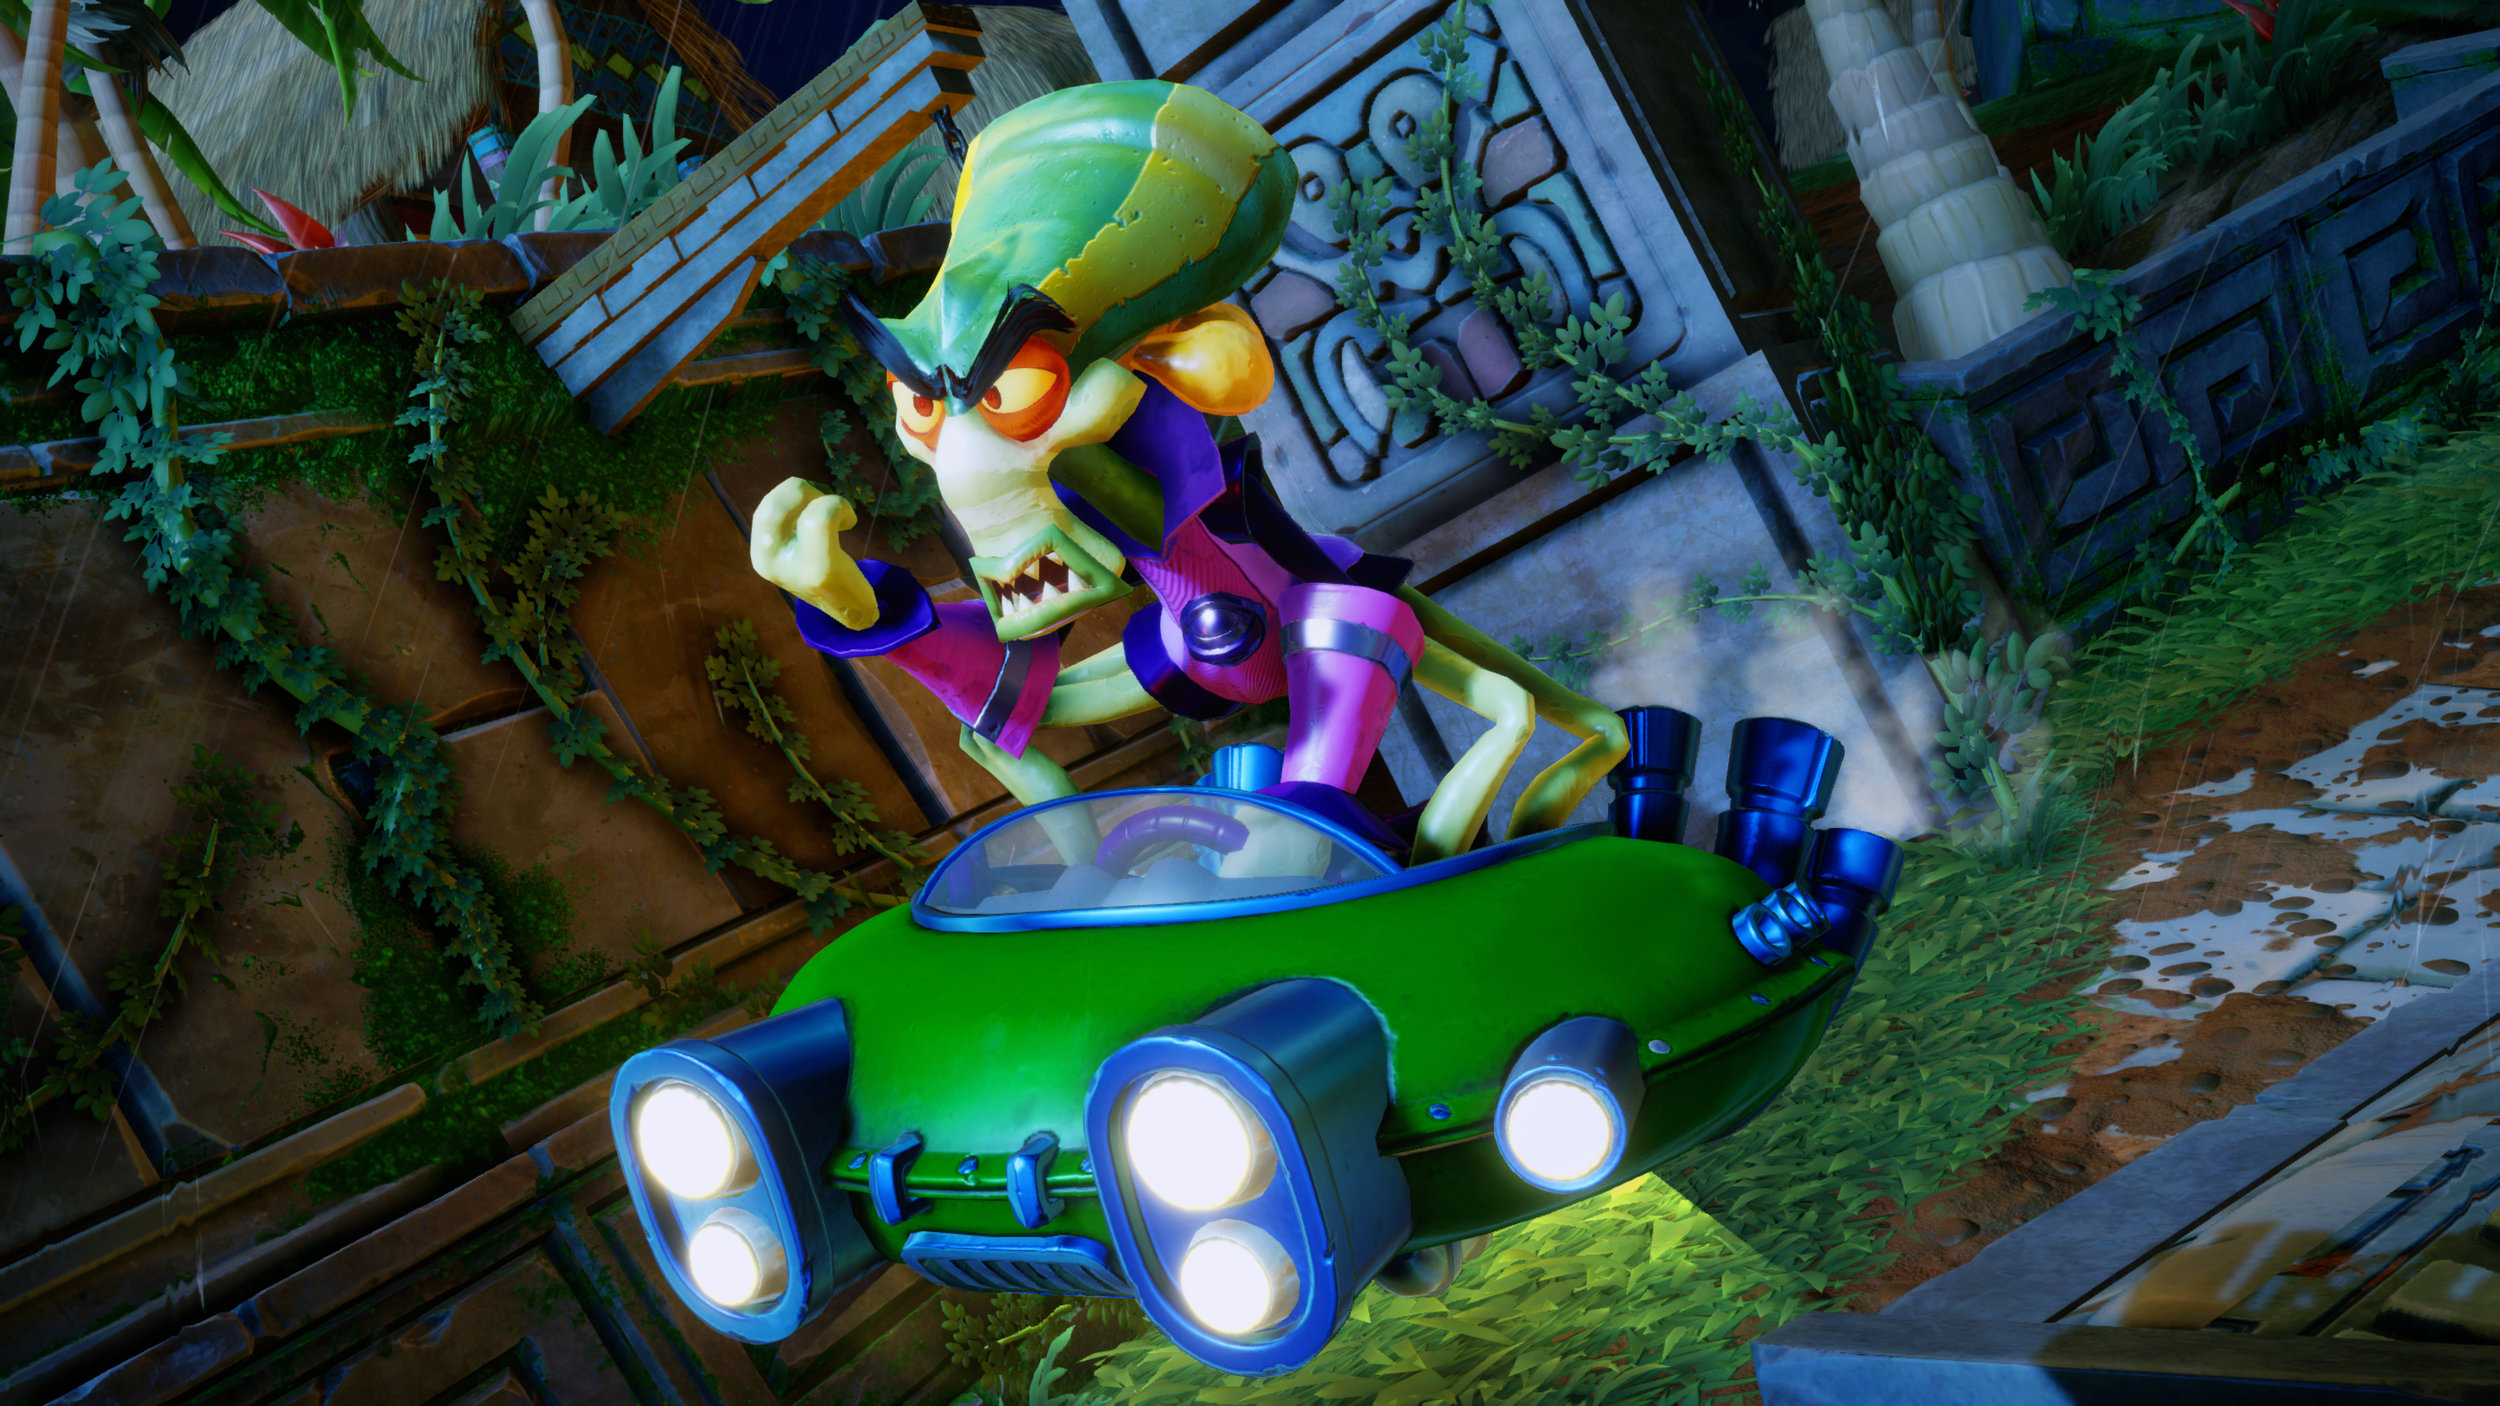 Crash Team Racing Nitro-Fueled Screen 5.jpg